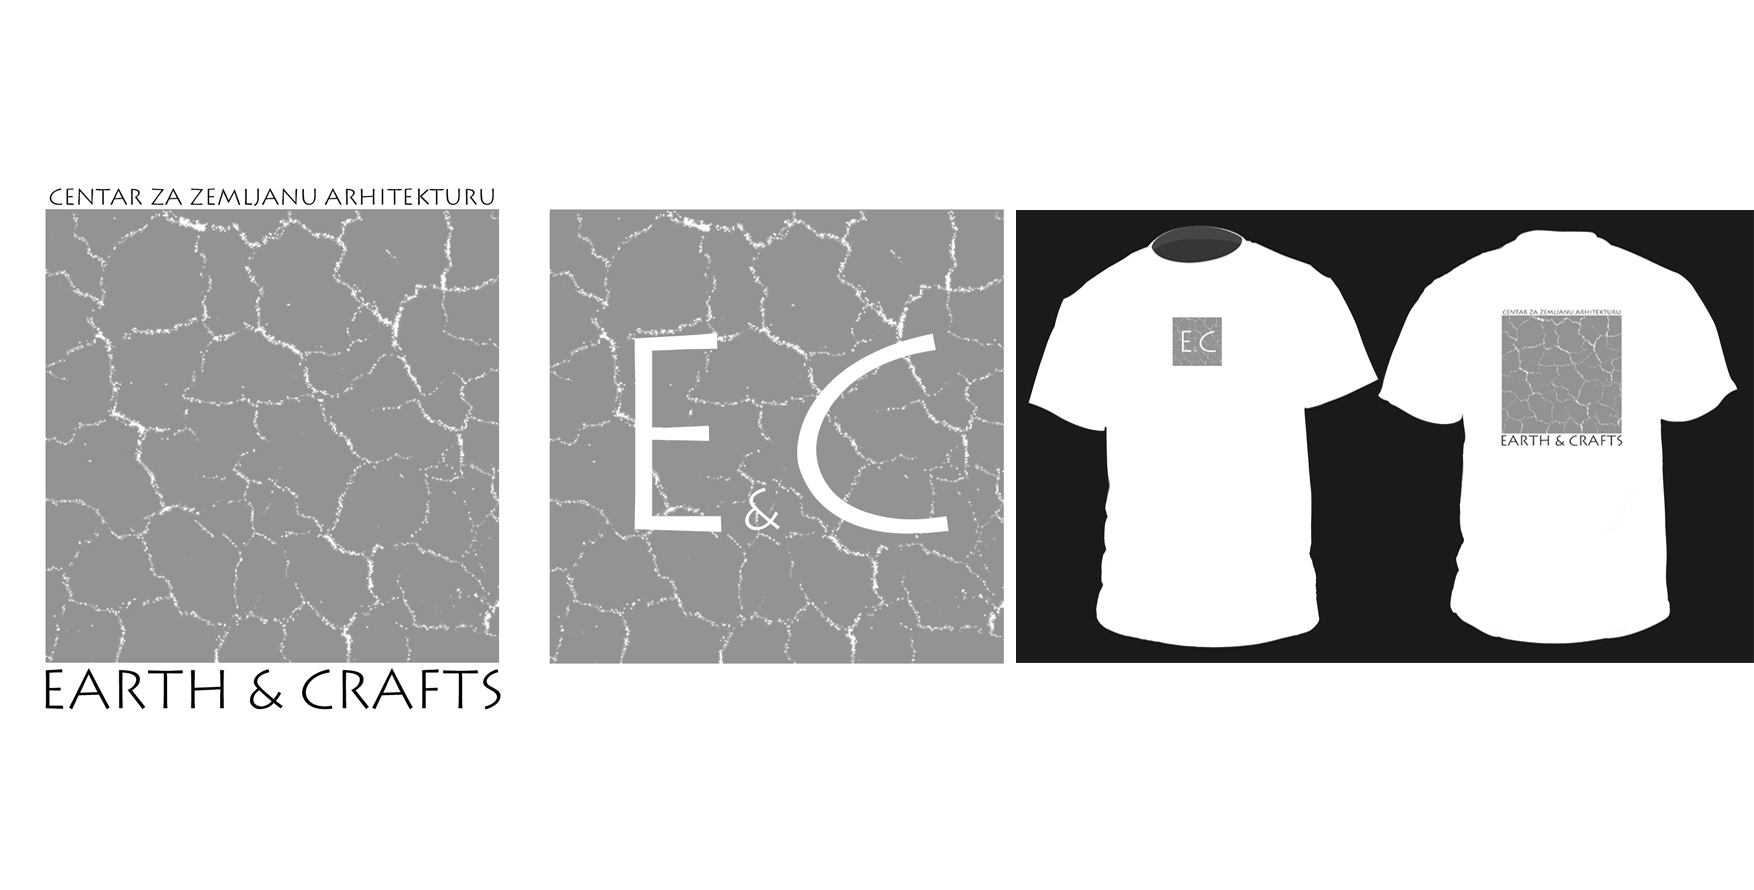 34 predlog logo EARTH&CRAFTS vladimir dragicevic vladopaval@yahoo.com